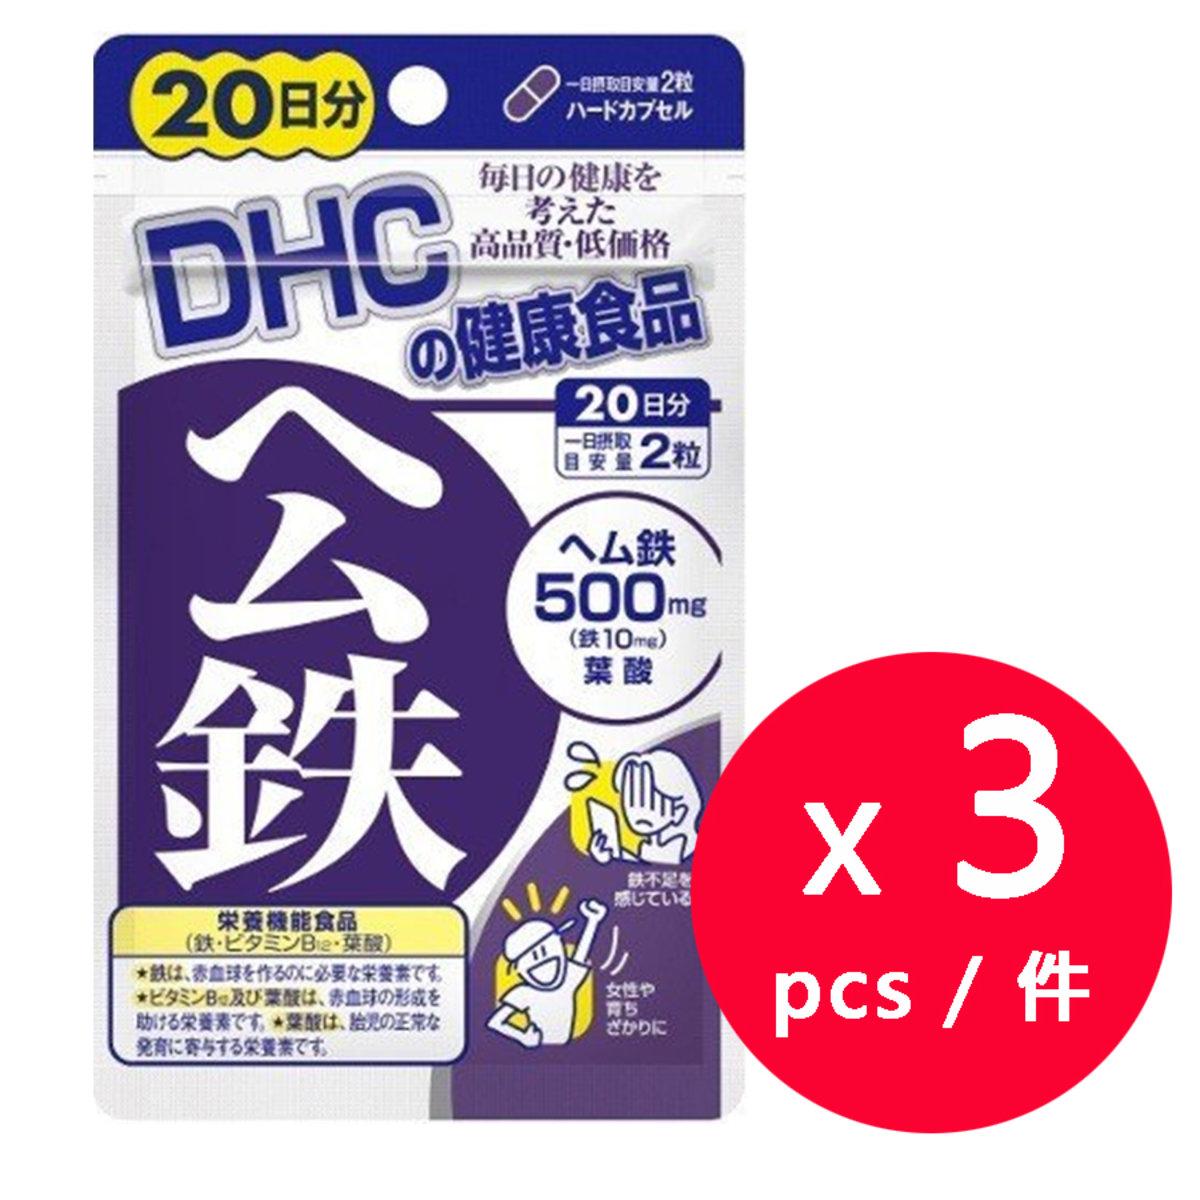 DHC 血紅嫩鐵精華素(20日份量) 40粒 x 3包 (平行進口)